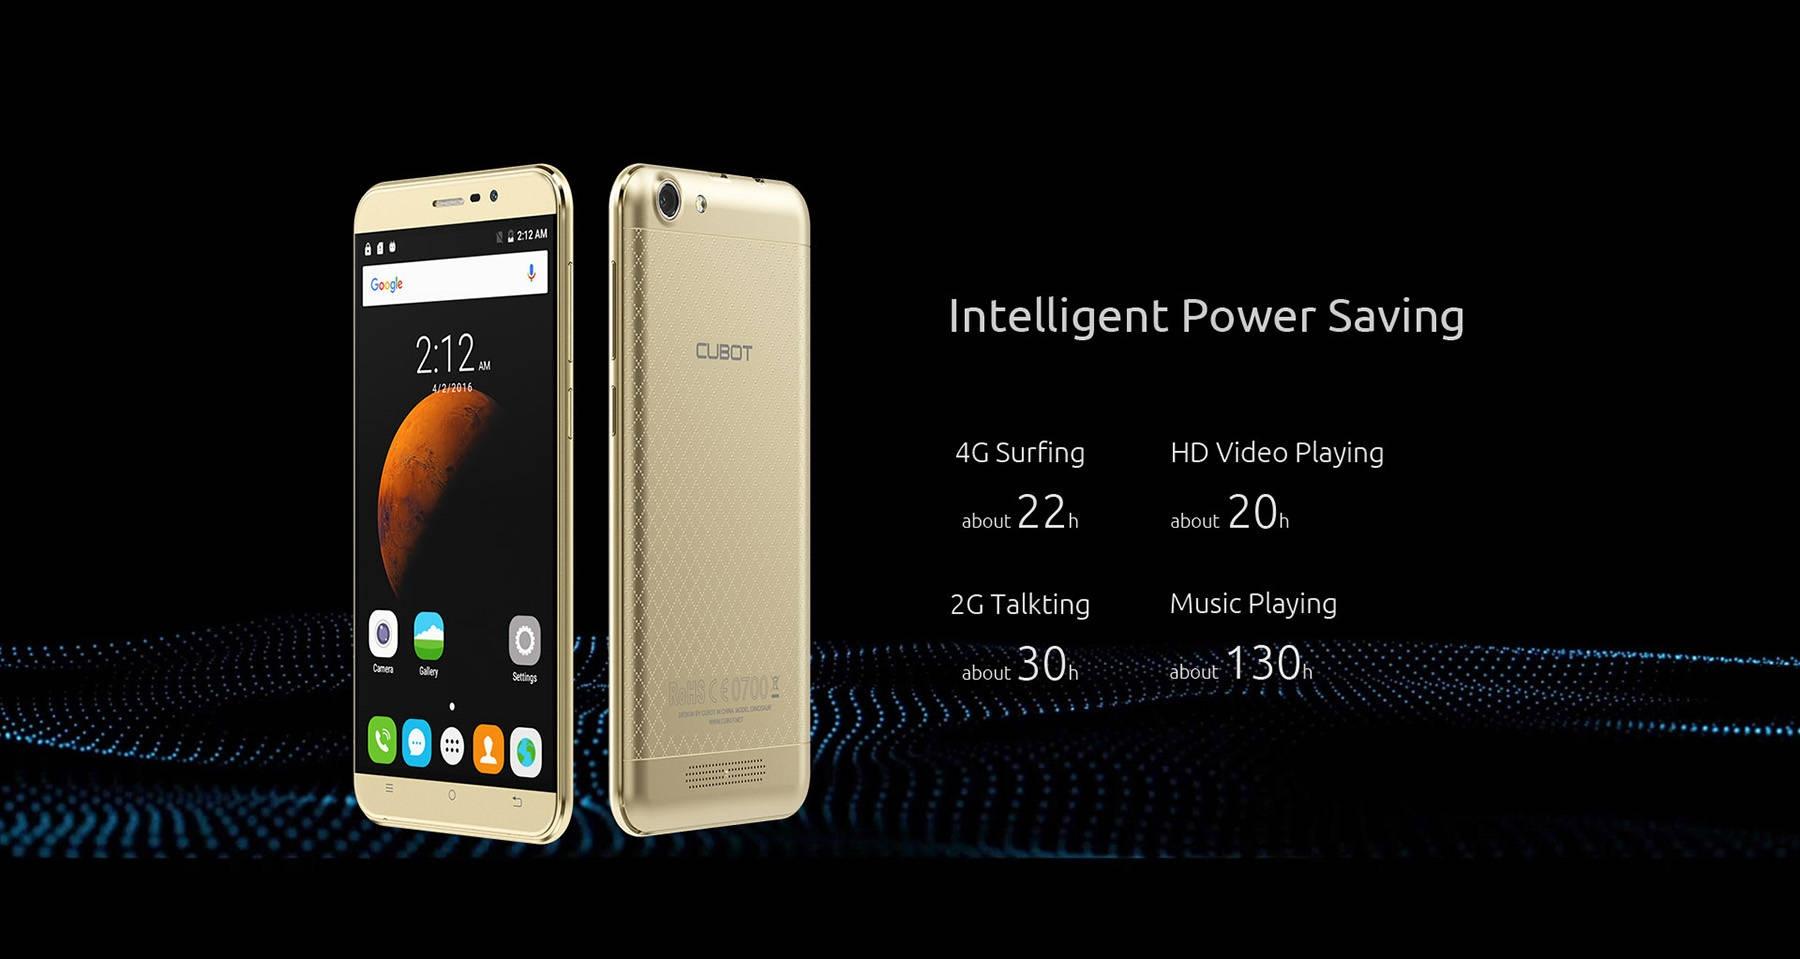 CUBOT Dinosaur 5.5 inch 4G Phablet Android 6.0 MTK6735 64bit Quad Core 1.3GHz 3GB RAM 16GB ROM HotKnot 4150mAh Battery